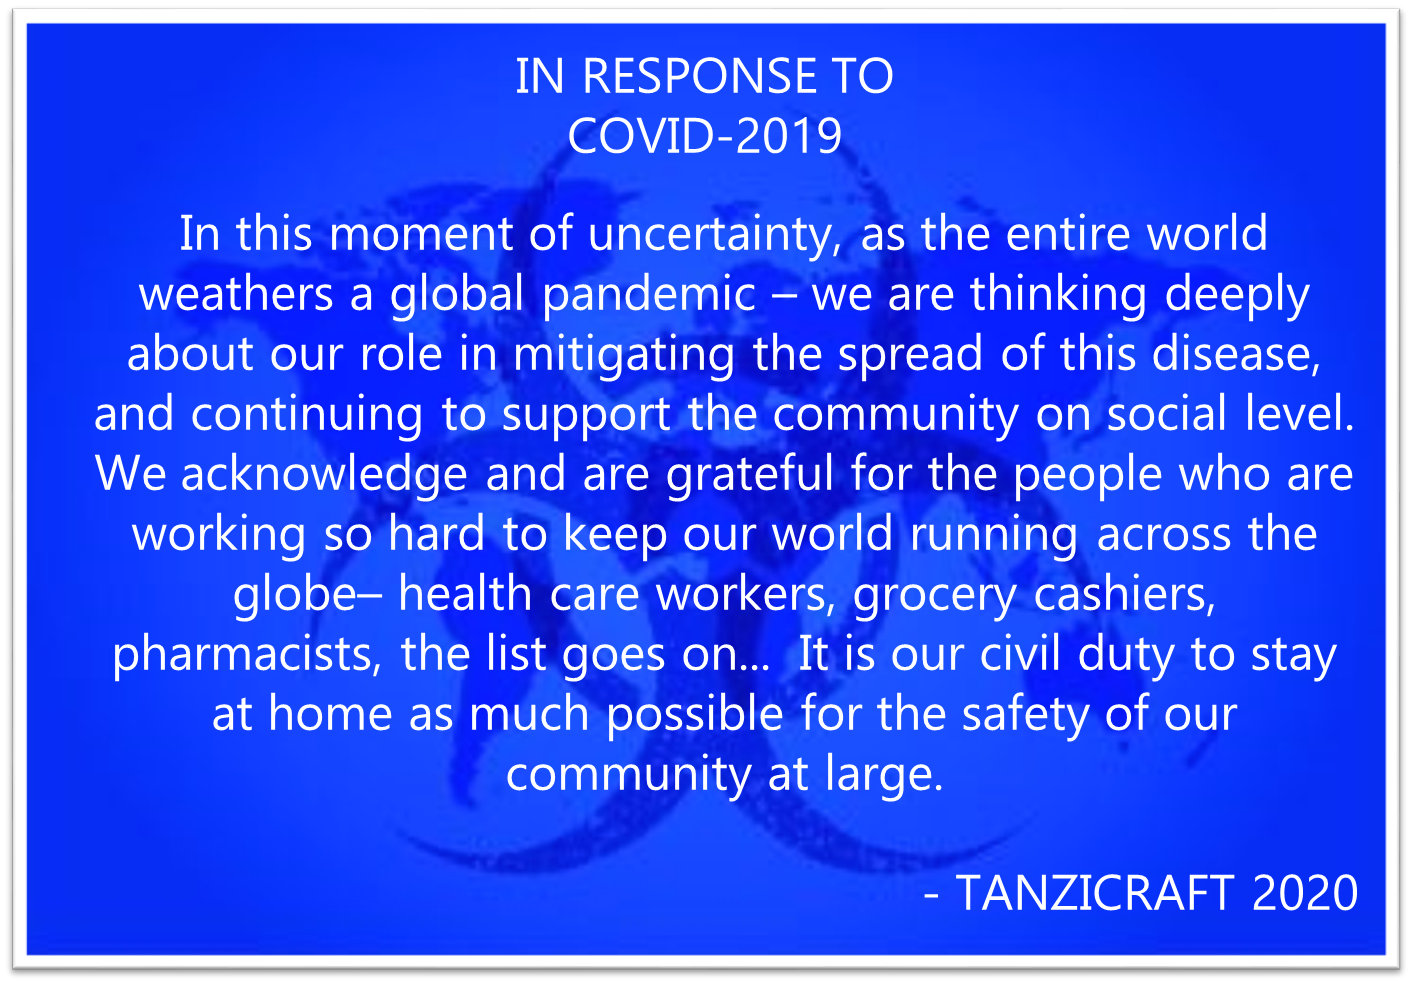 #gocorona #safety #socialmediamarketing #social #life #nopanic #world #diseaseprevention #tanzicraft #tanzicrafts